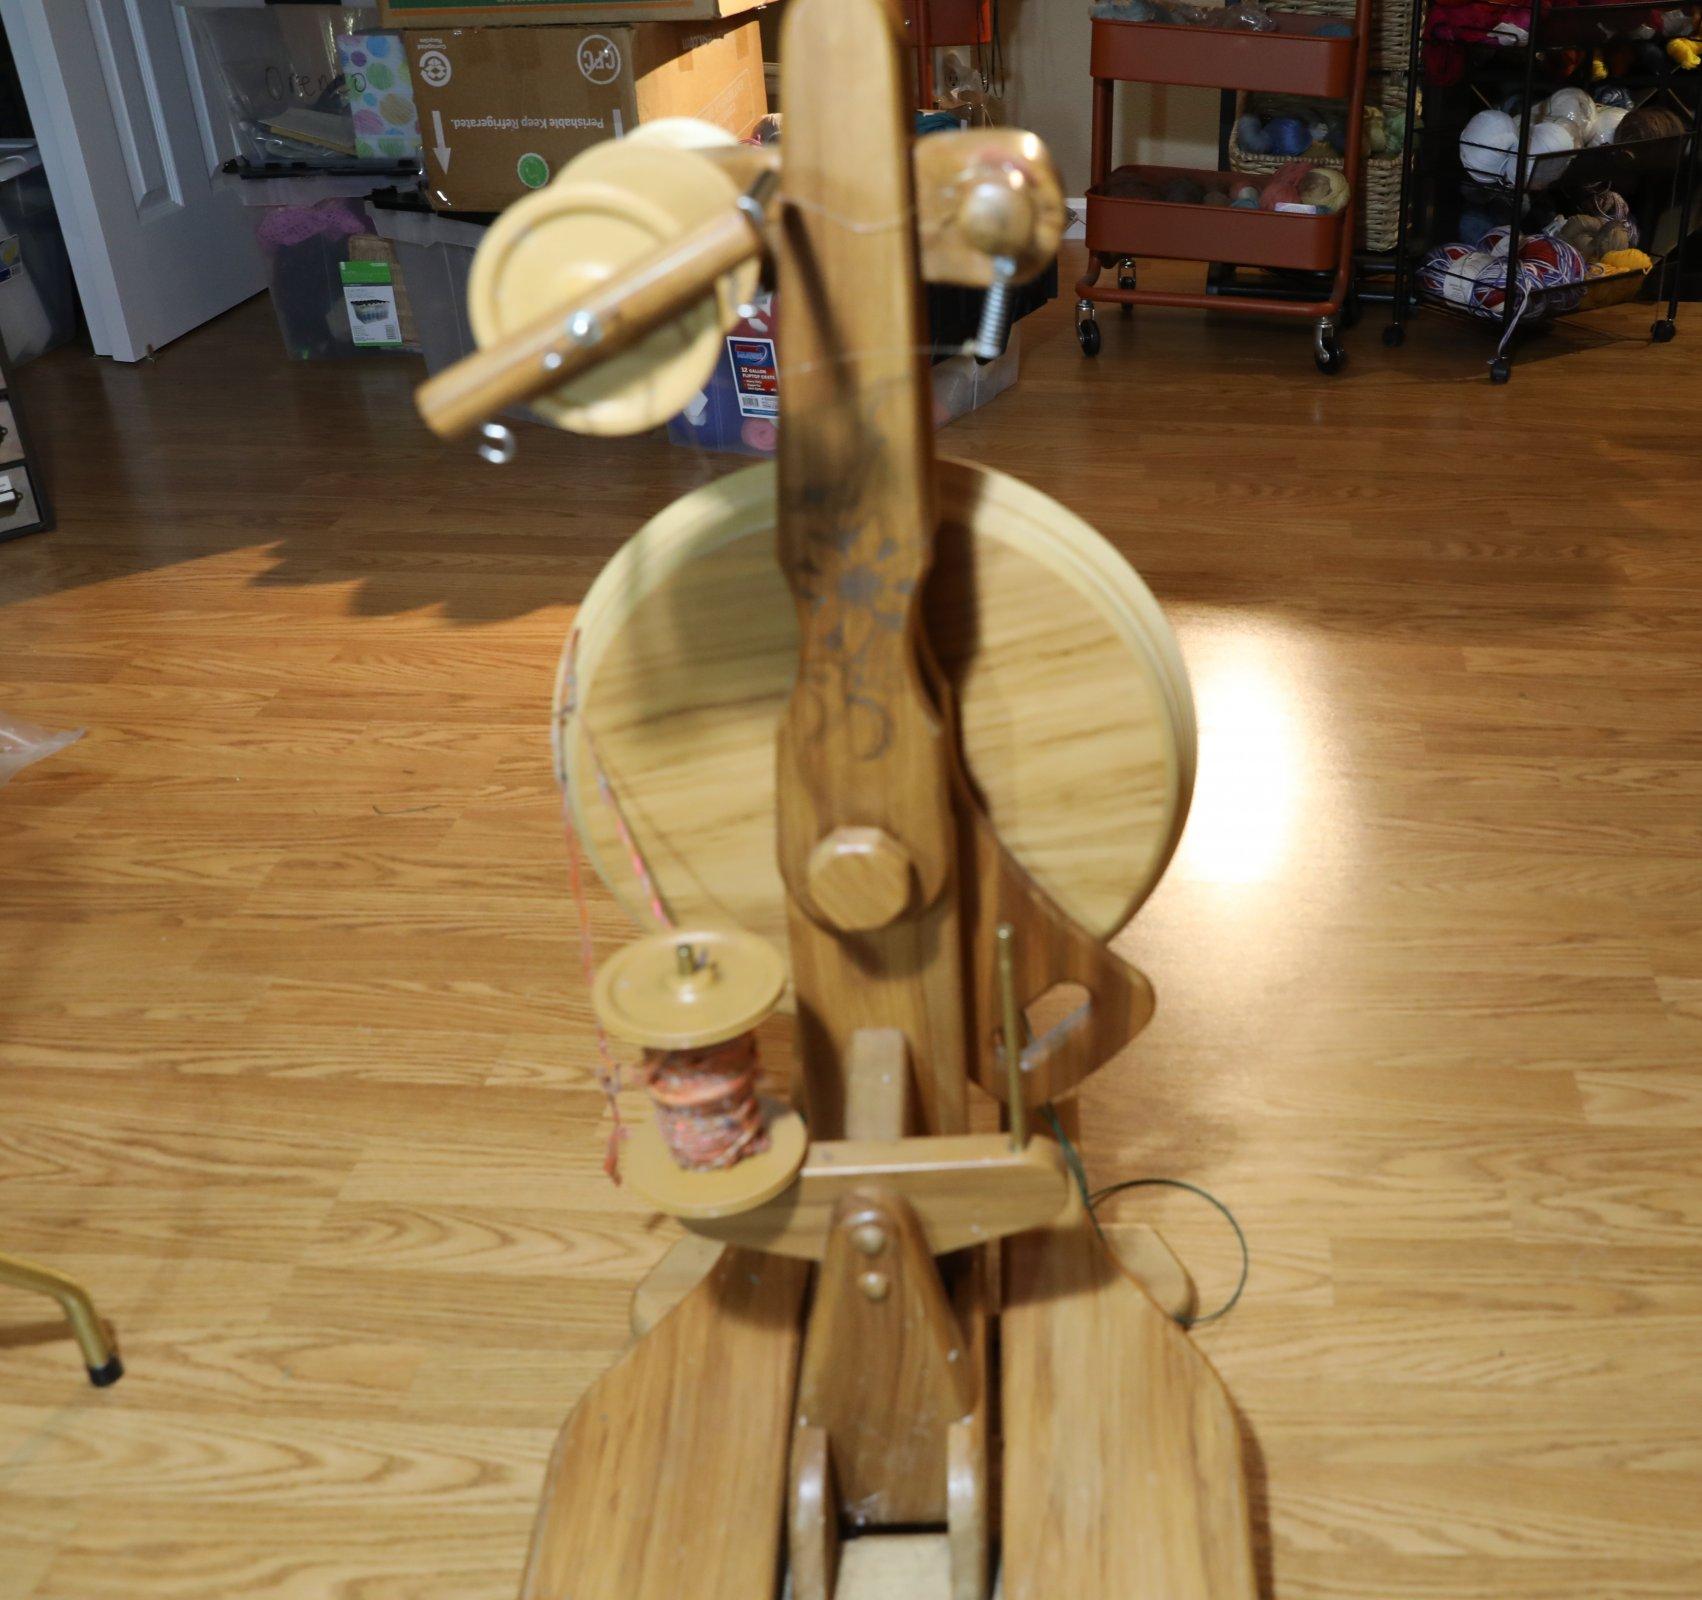 Used Majacraft Suzie Spinning Wheel- Rose Design